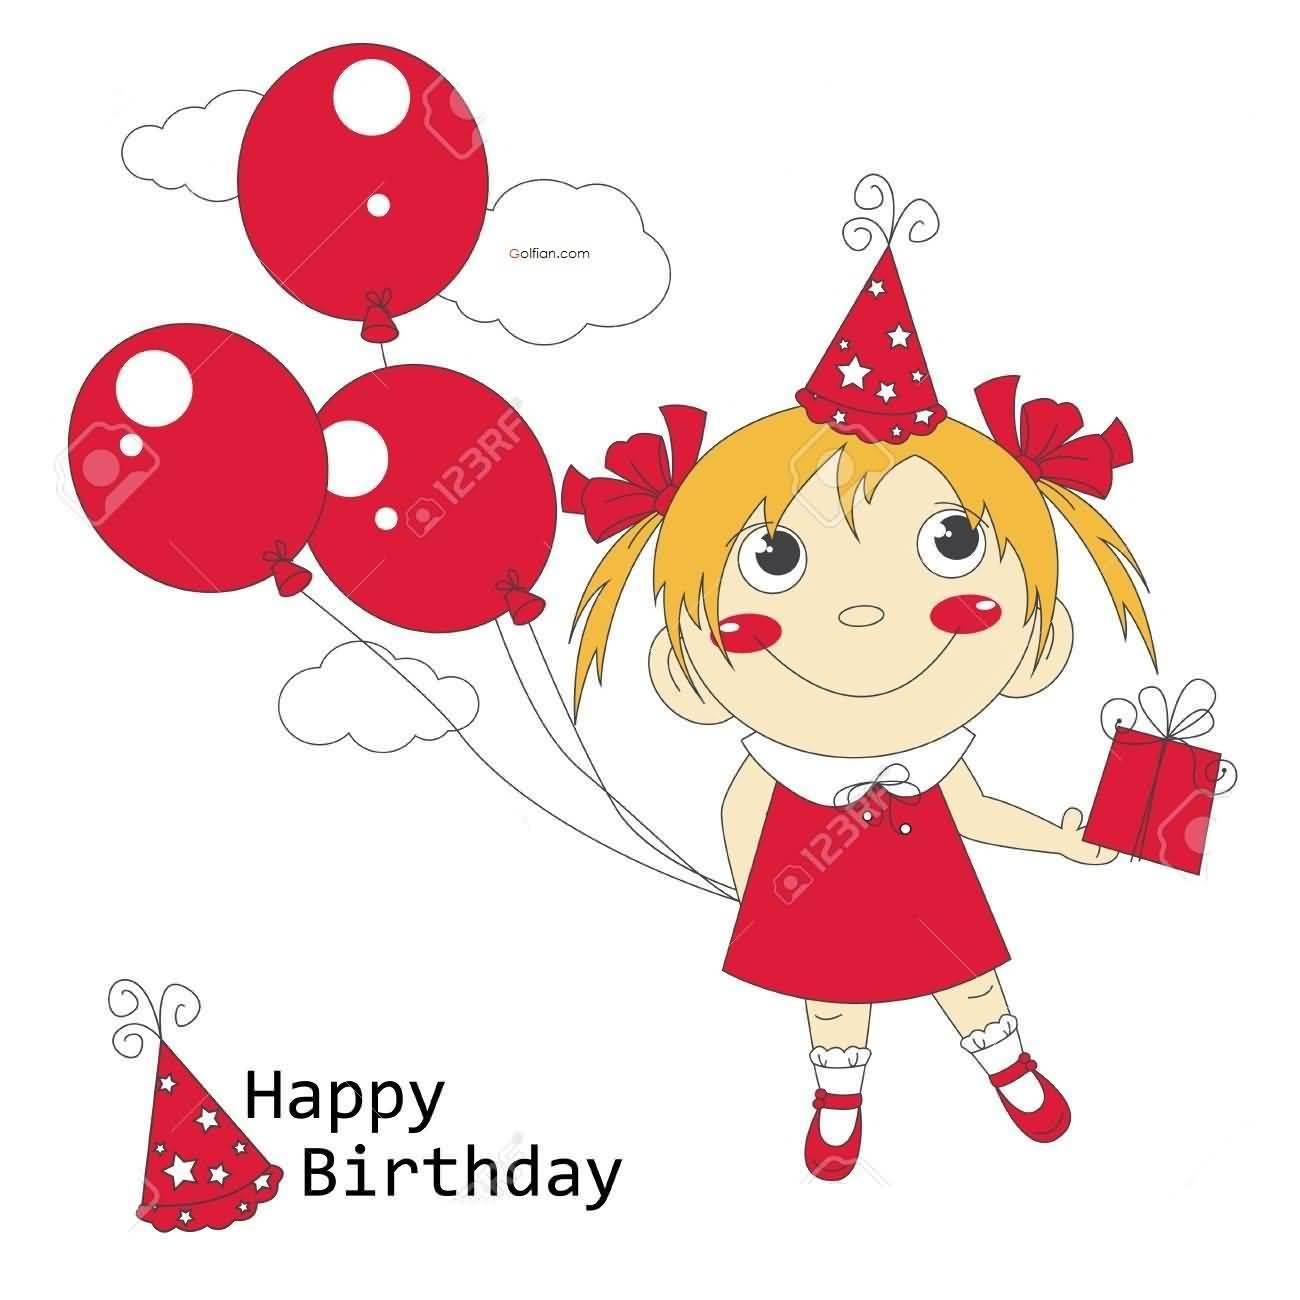 1300x1300 Best Birthday Wishes For Girls Beautiful Birthday Greeting